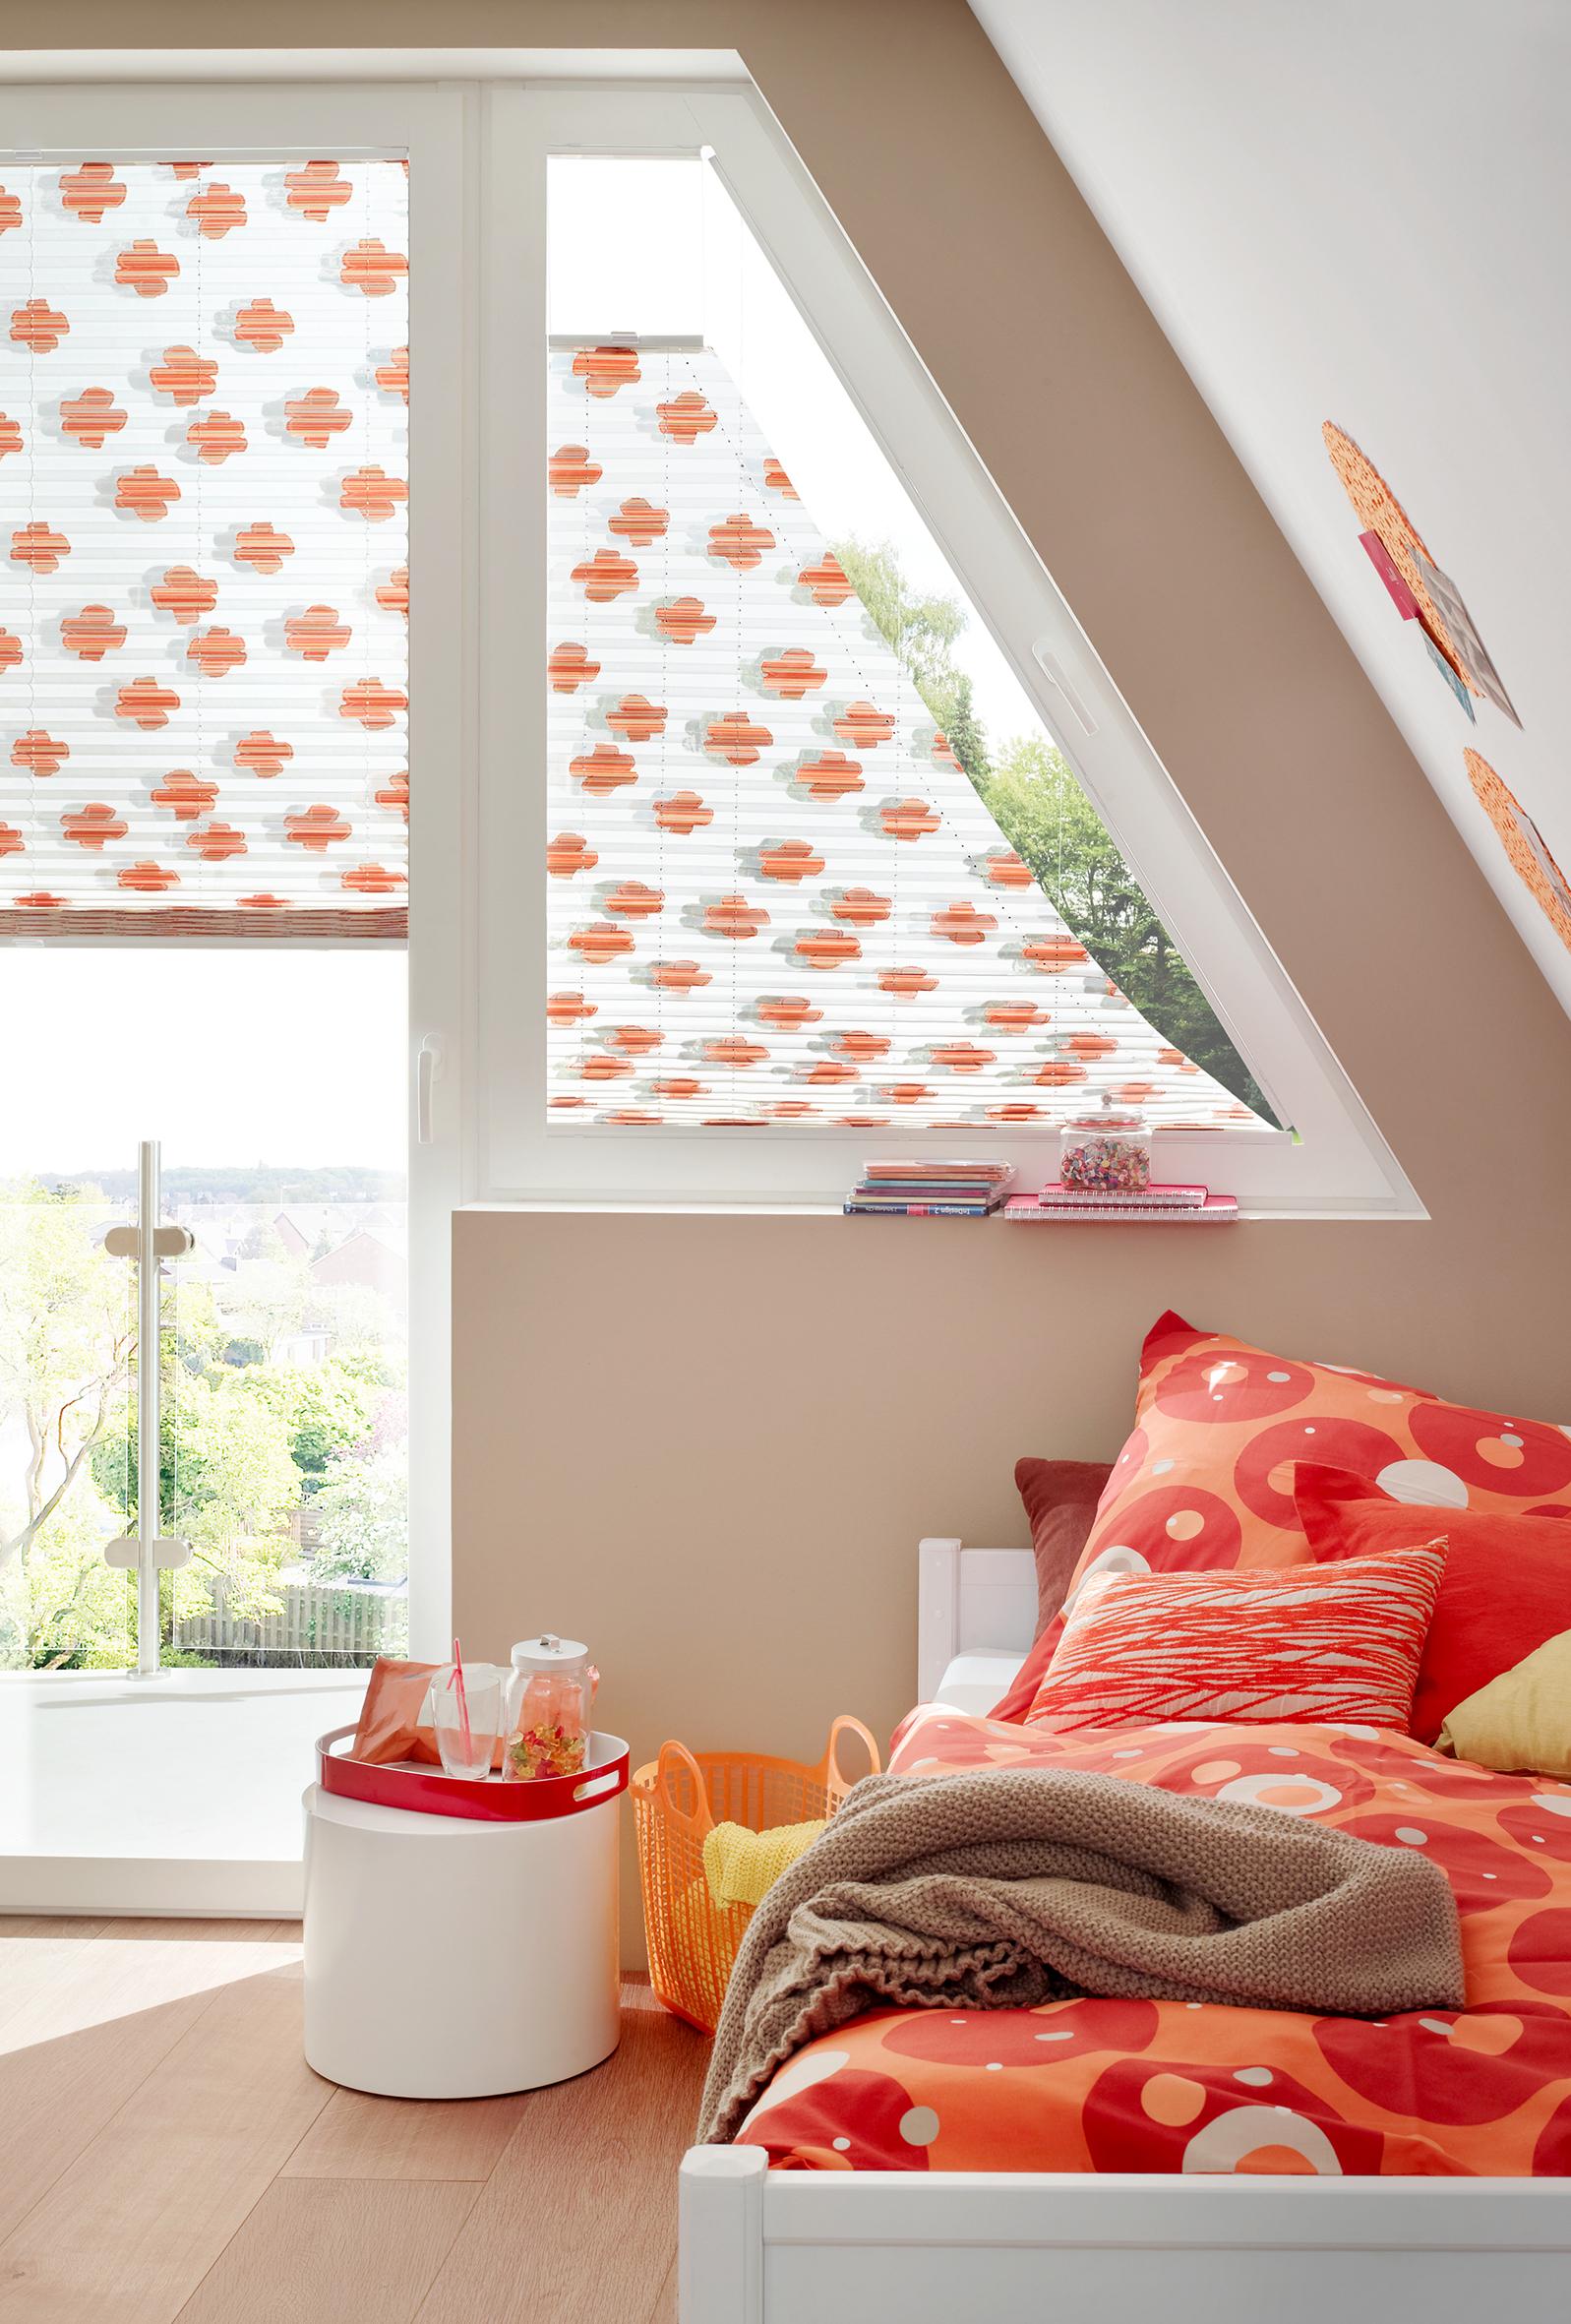 Full Size of Plissee Kinderzimmer Images Tagged Trapez Raumkonzept Werne Regal Weiß Sofa Fenster Regale Kinderzimmer Plissee Kinderzimmer